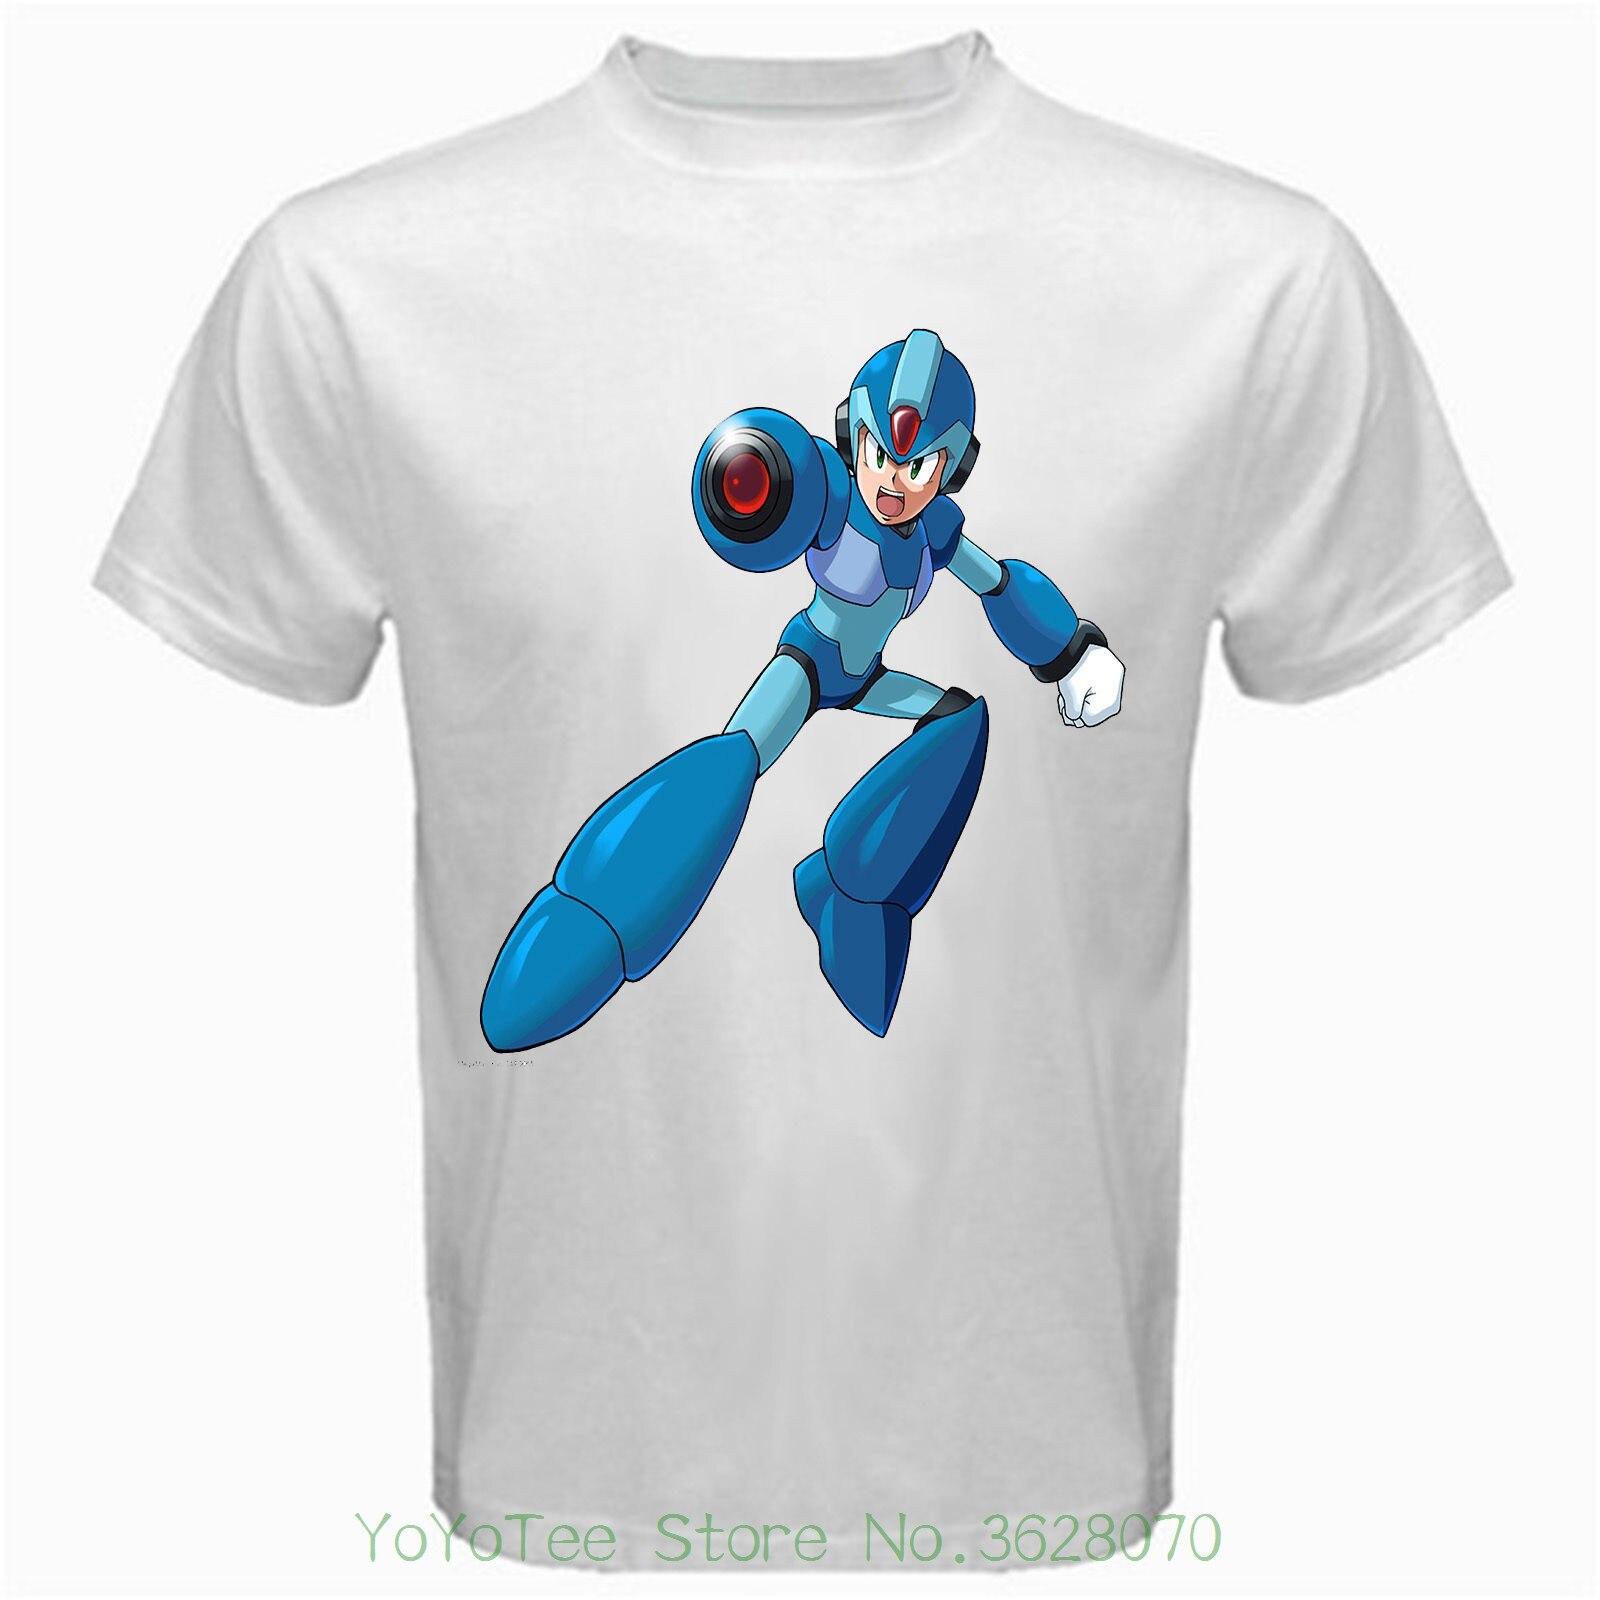 Men's High Quality Custom Printed Tops Hipster Tees Megaman X Retro Video Game Tshirt White Basic Tee